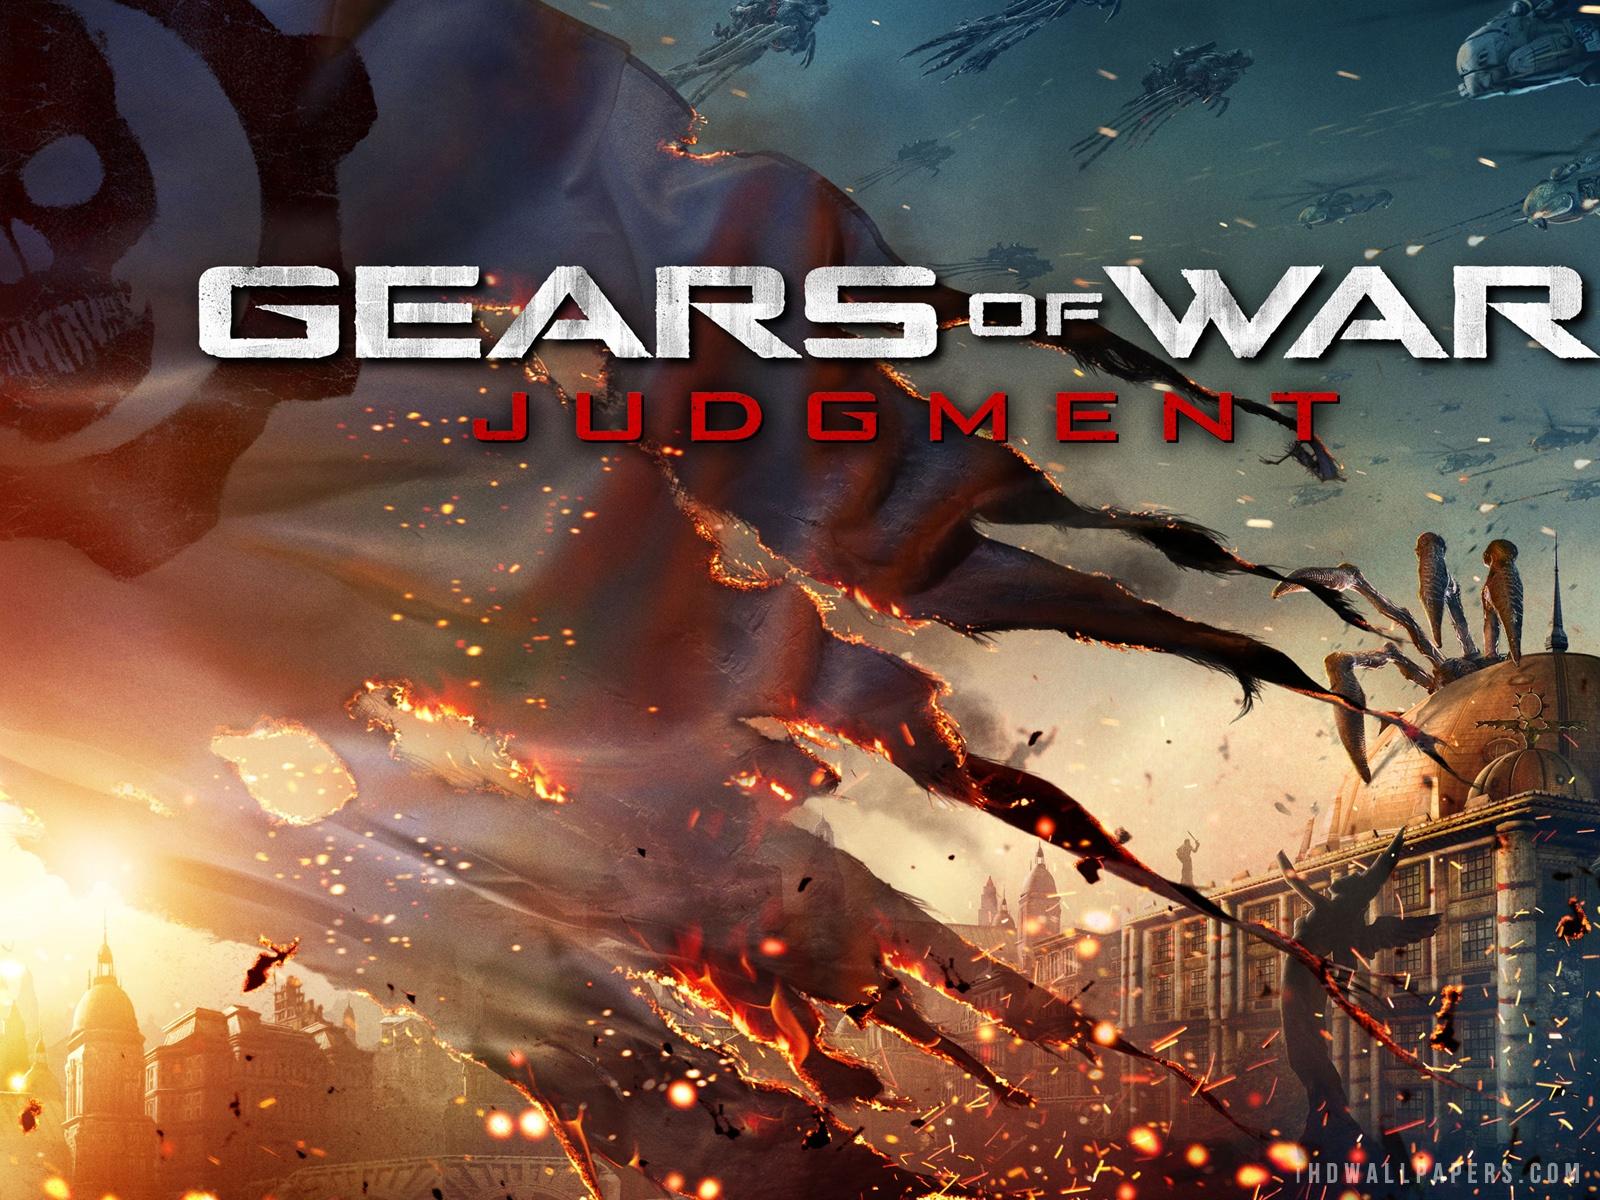 Description Download Gears of War Judgment Game WallpaperBackground 1600x1200